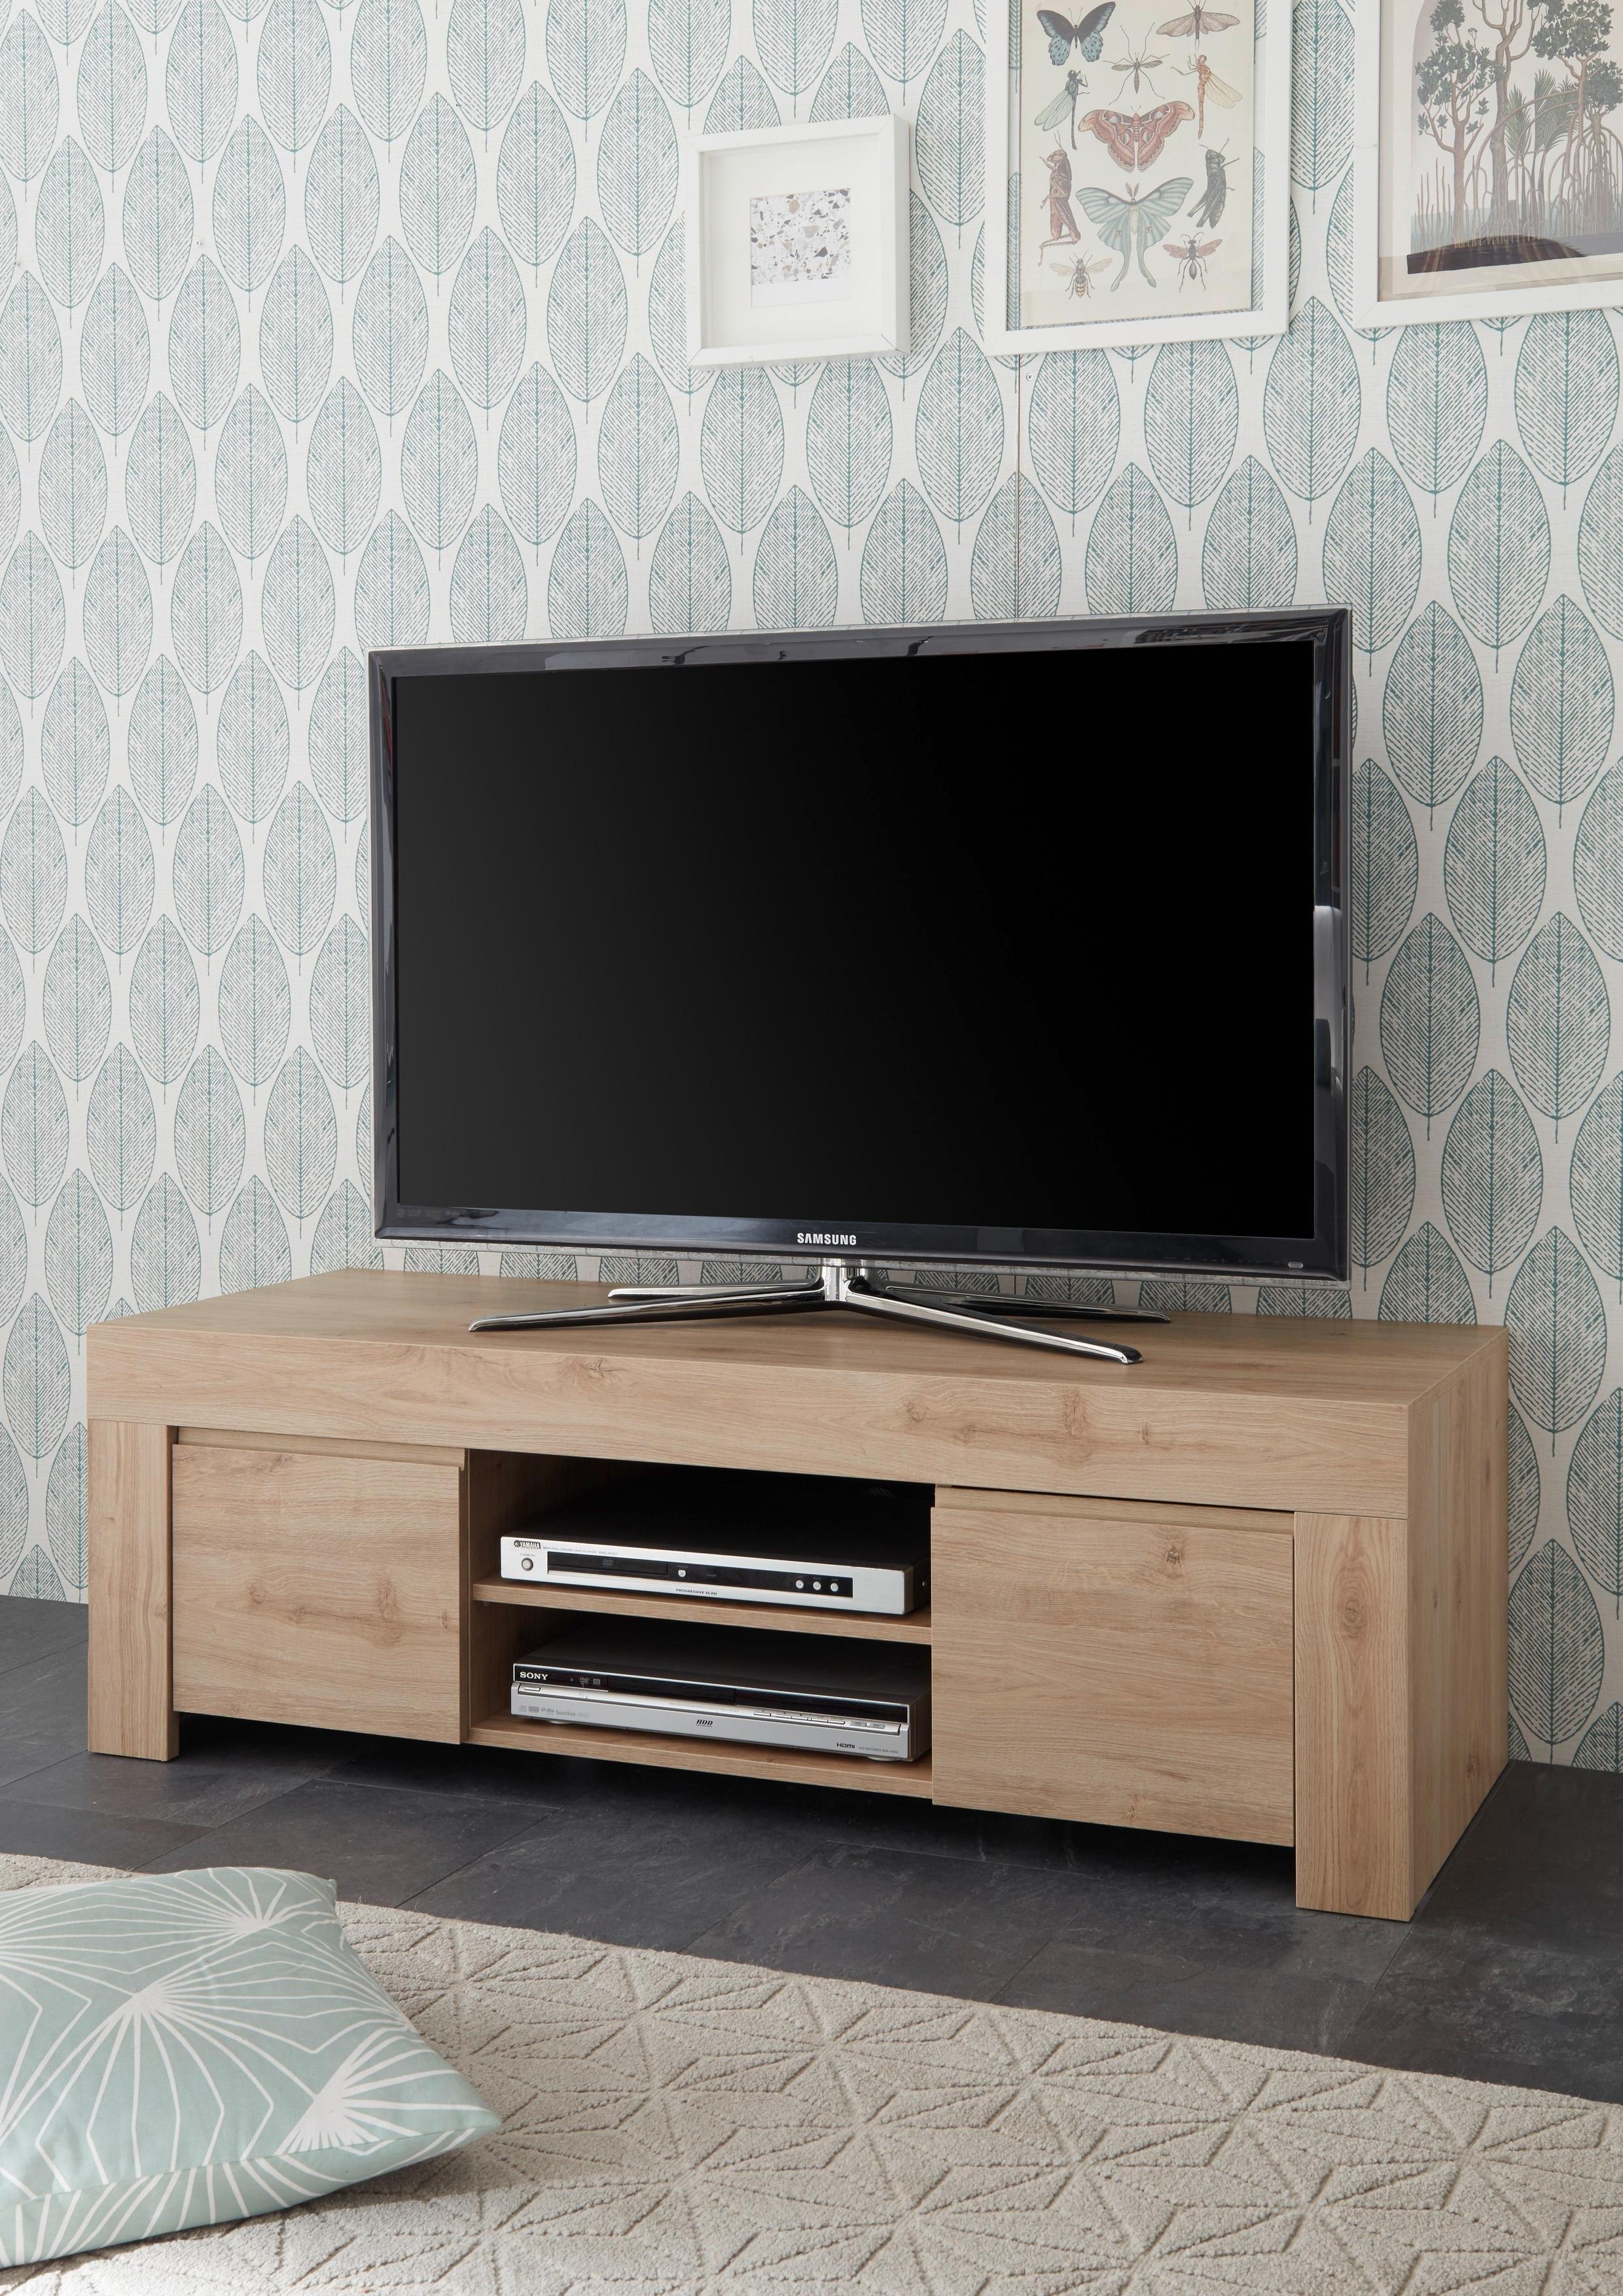 LC tv-meubel »Firenze«, breedte 138 cm nu online bestellen